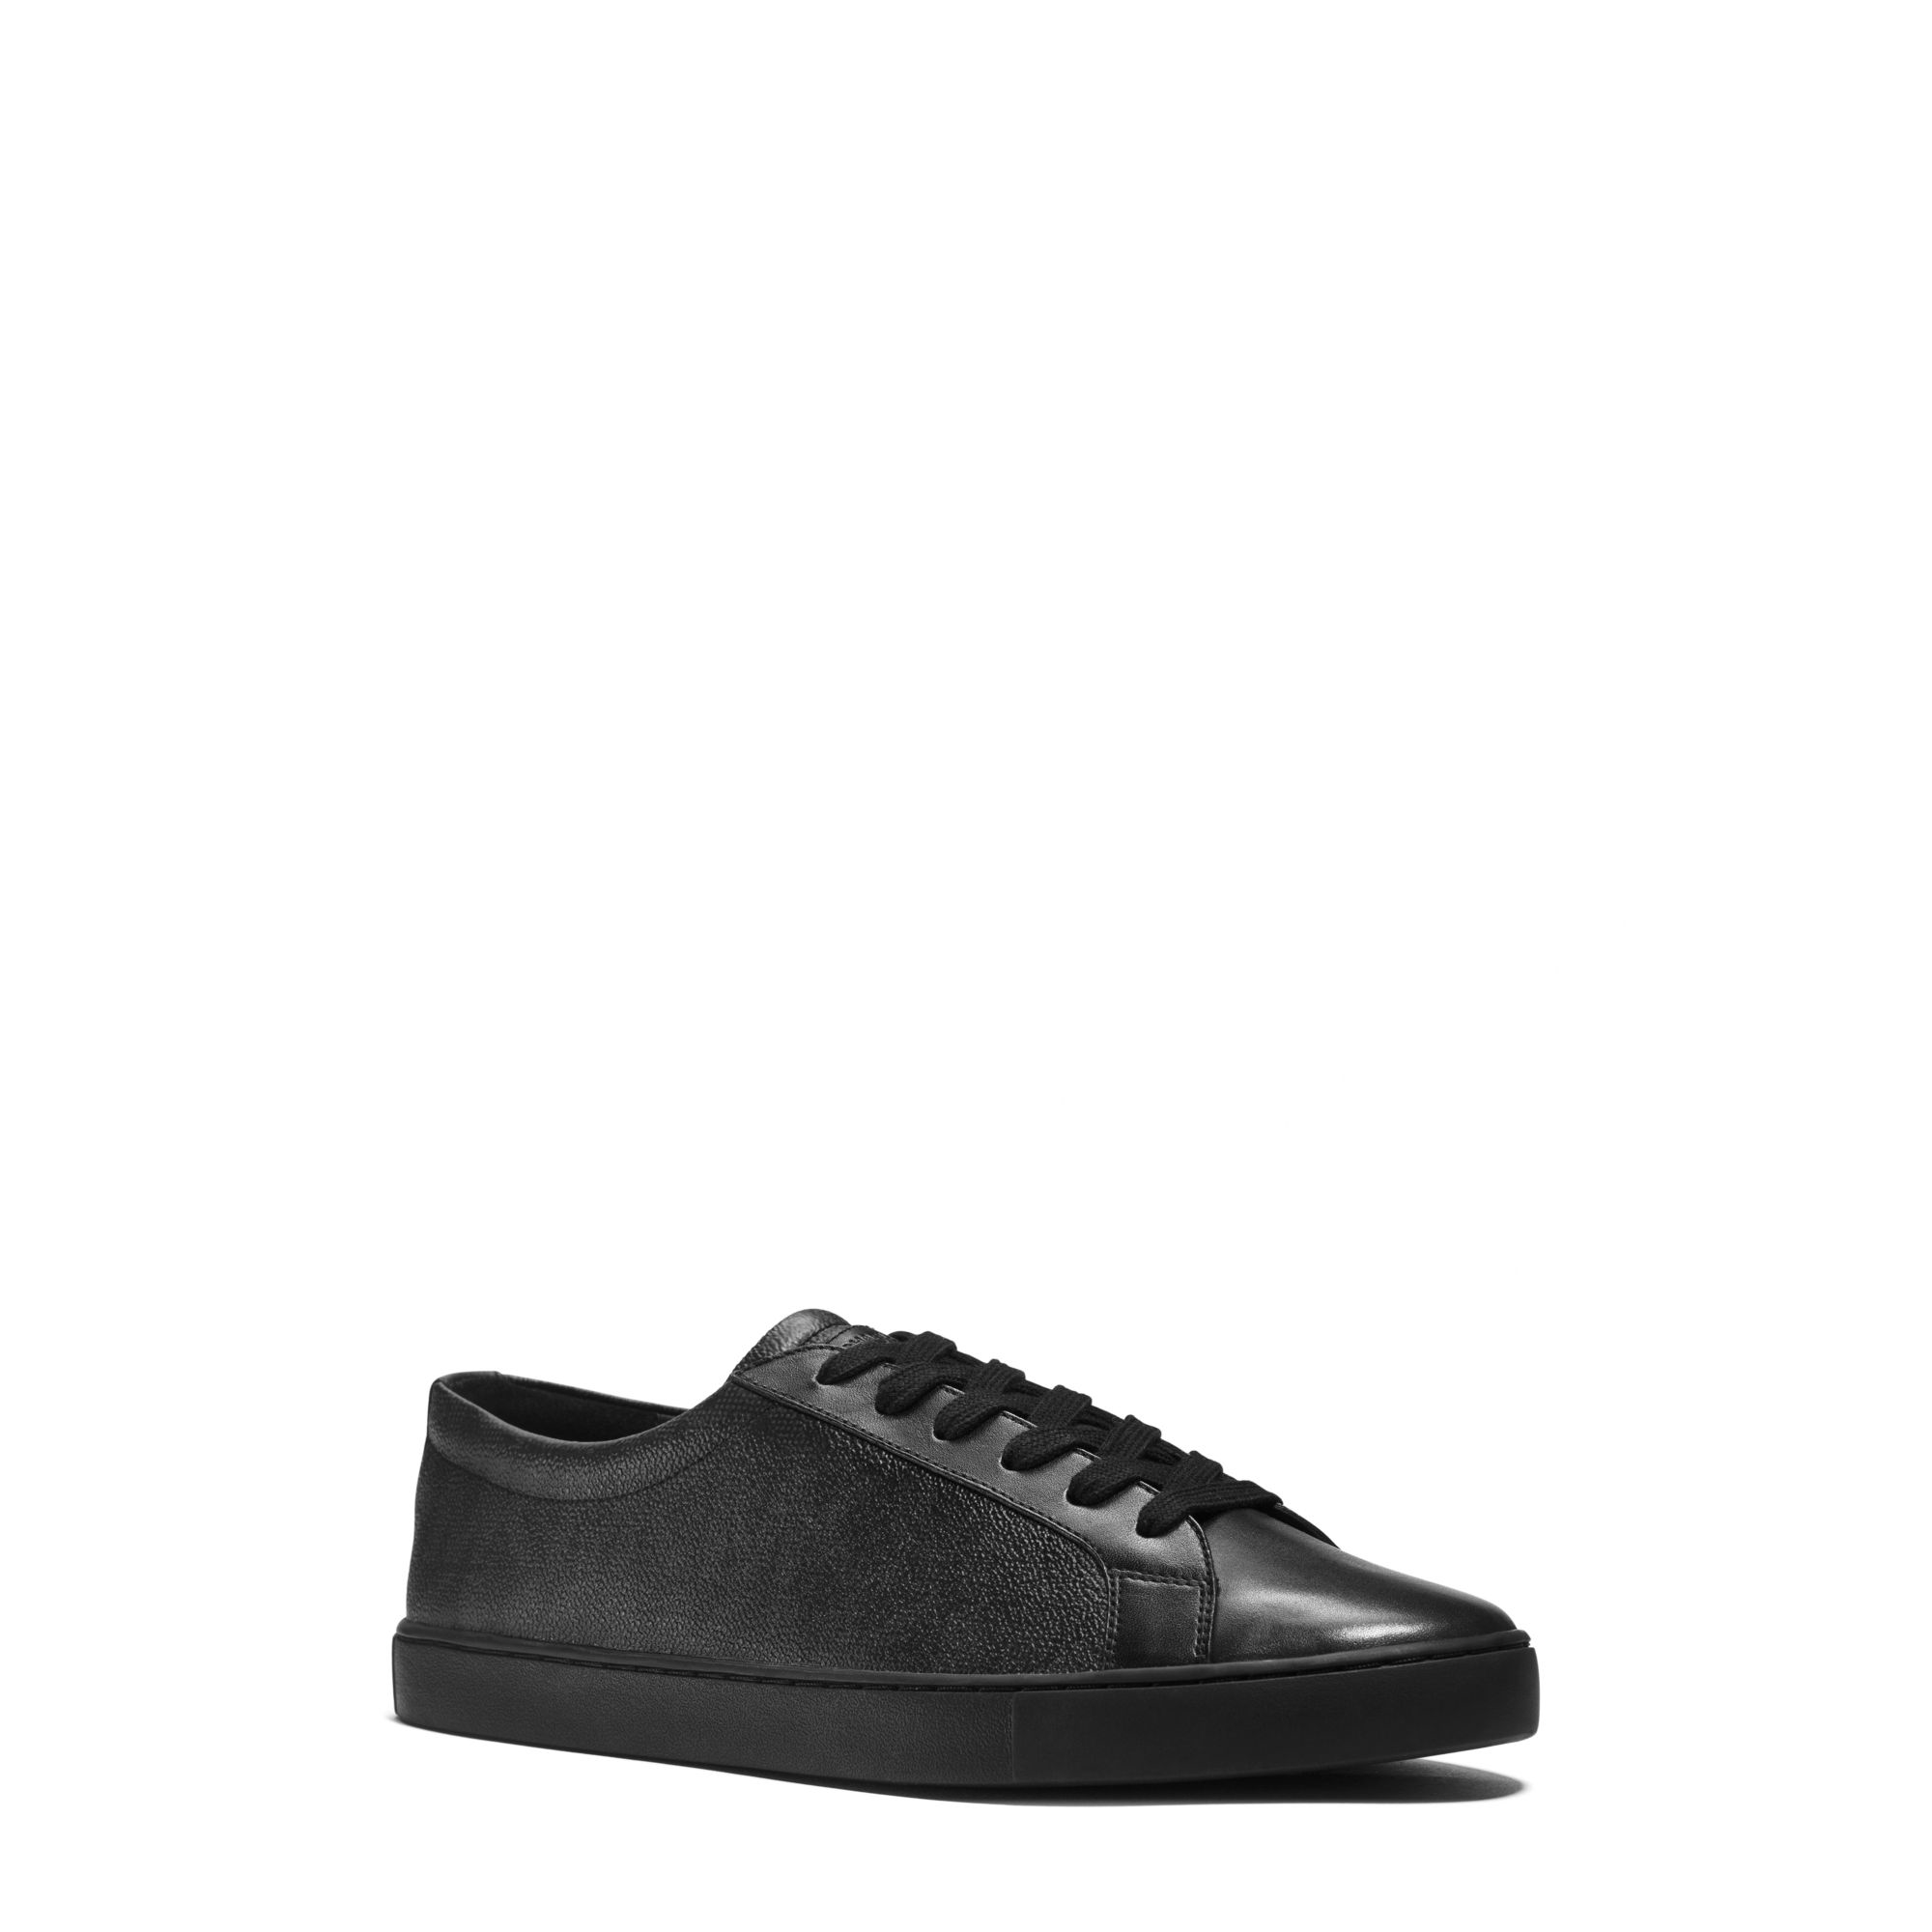 michael kors jake logo sneaker in black for men lyst. Black Bedroom Furniture Sets. Home Design Ideas